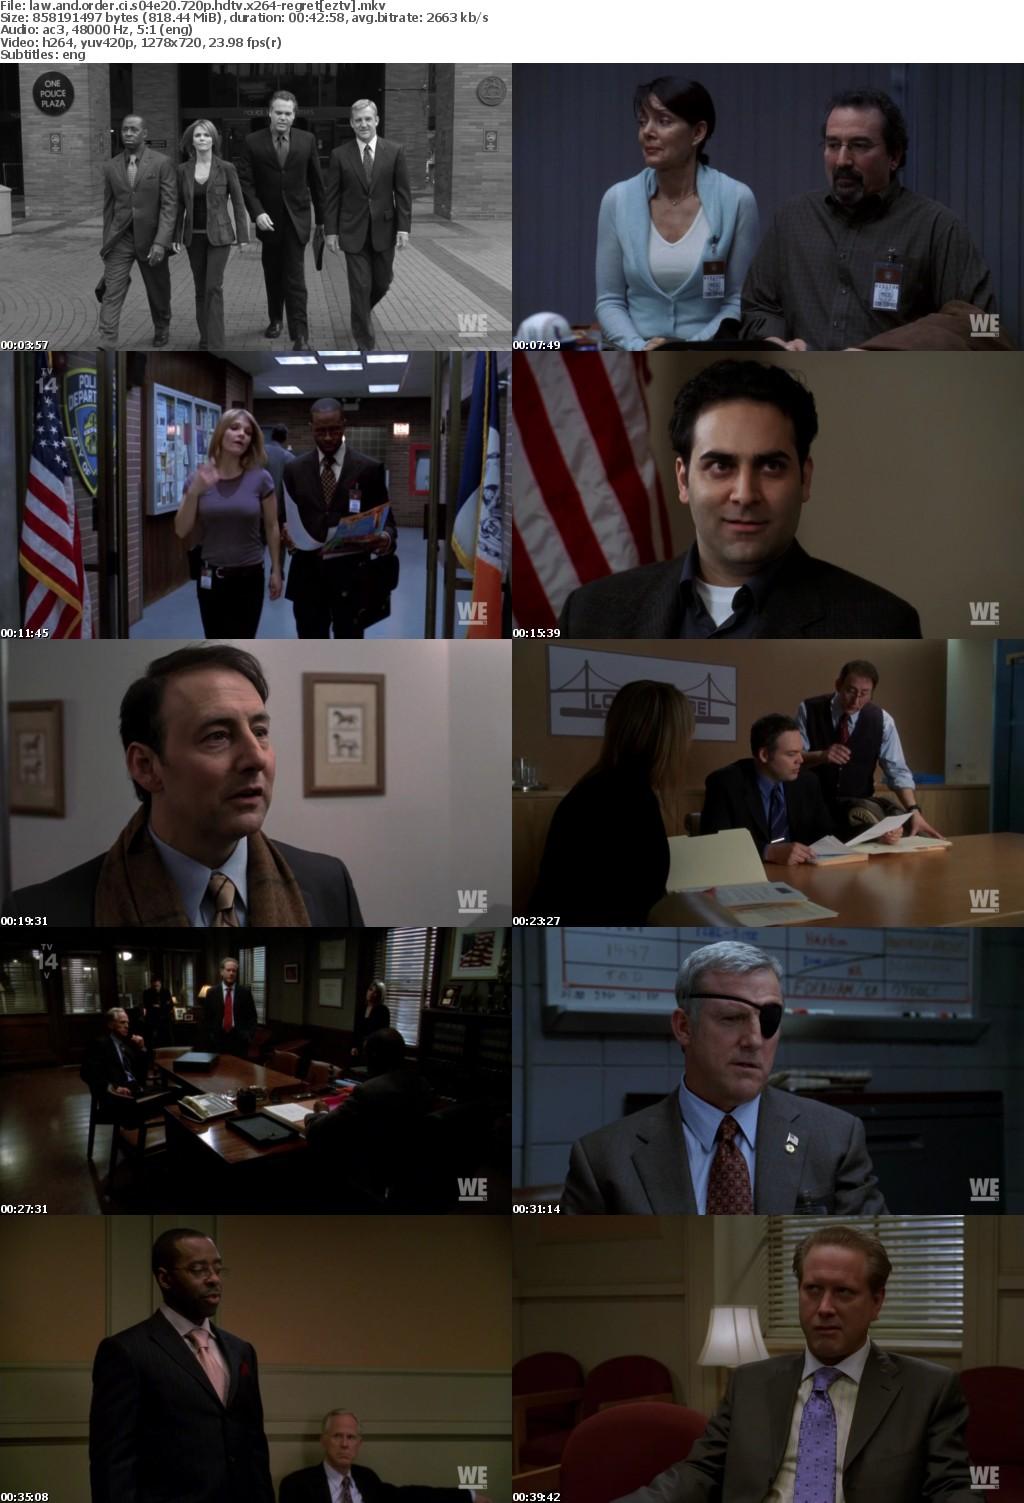 Law and Order CI S04E20 720p HDTV x264-REGRET